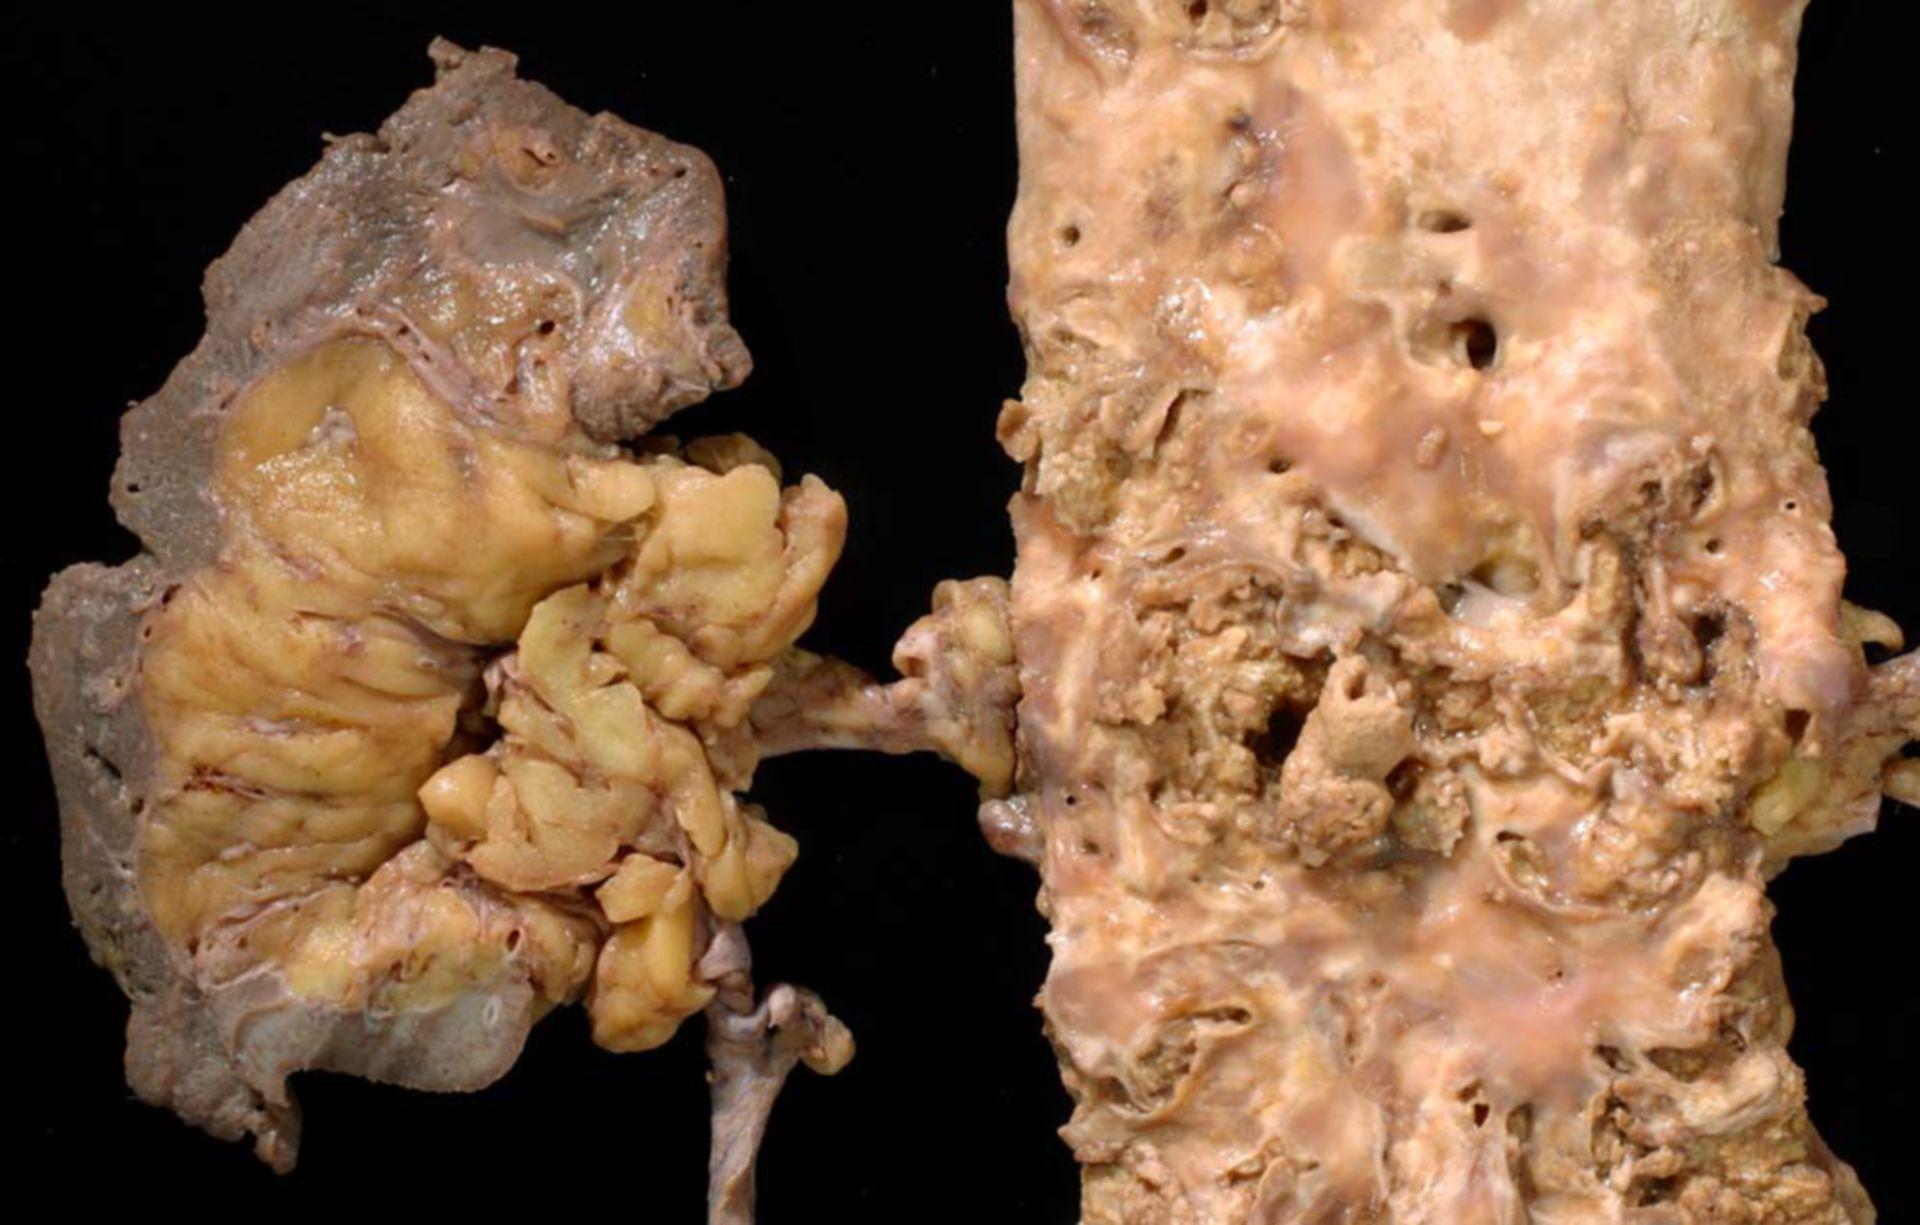 Riñon cirrótico, oclusión de la raíz de la arteria renal